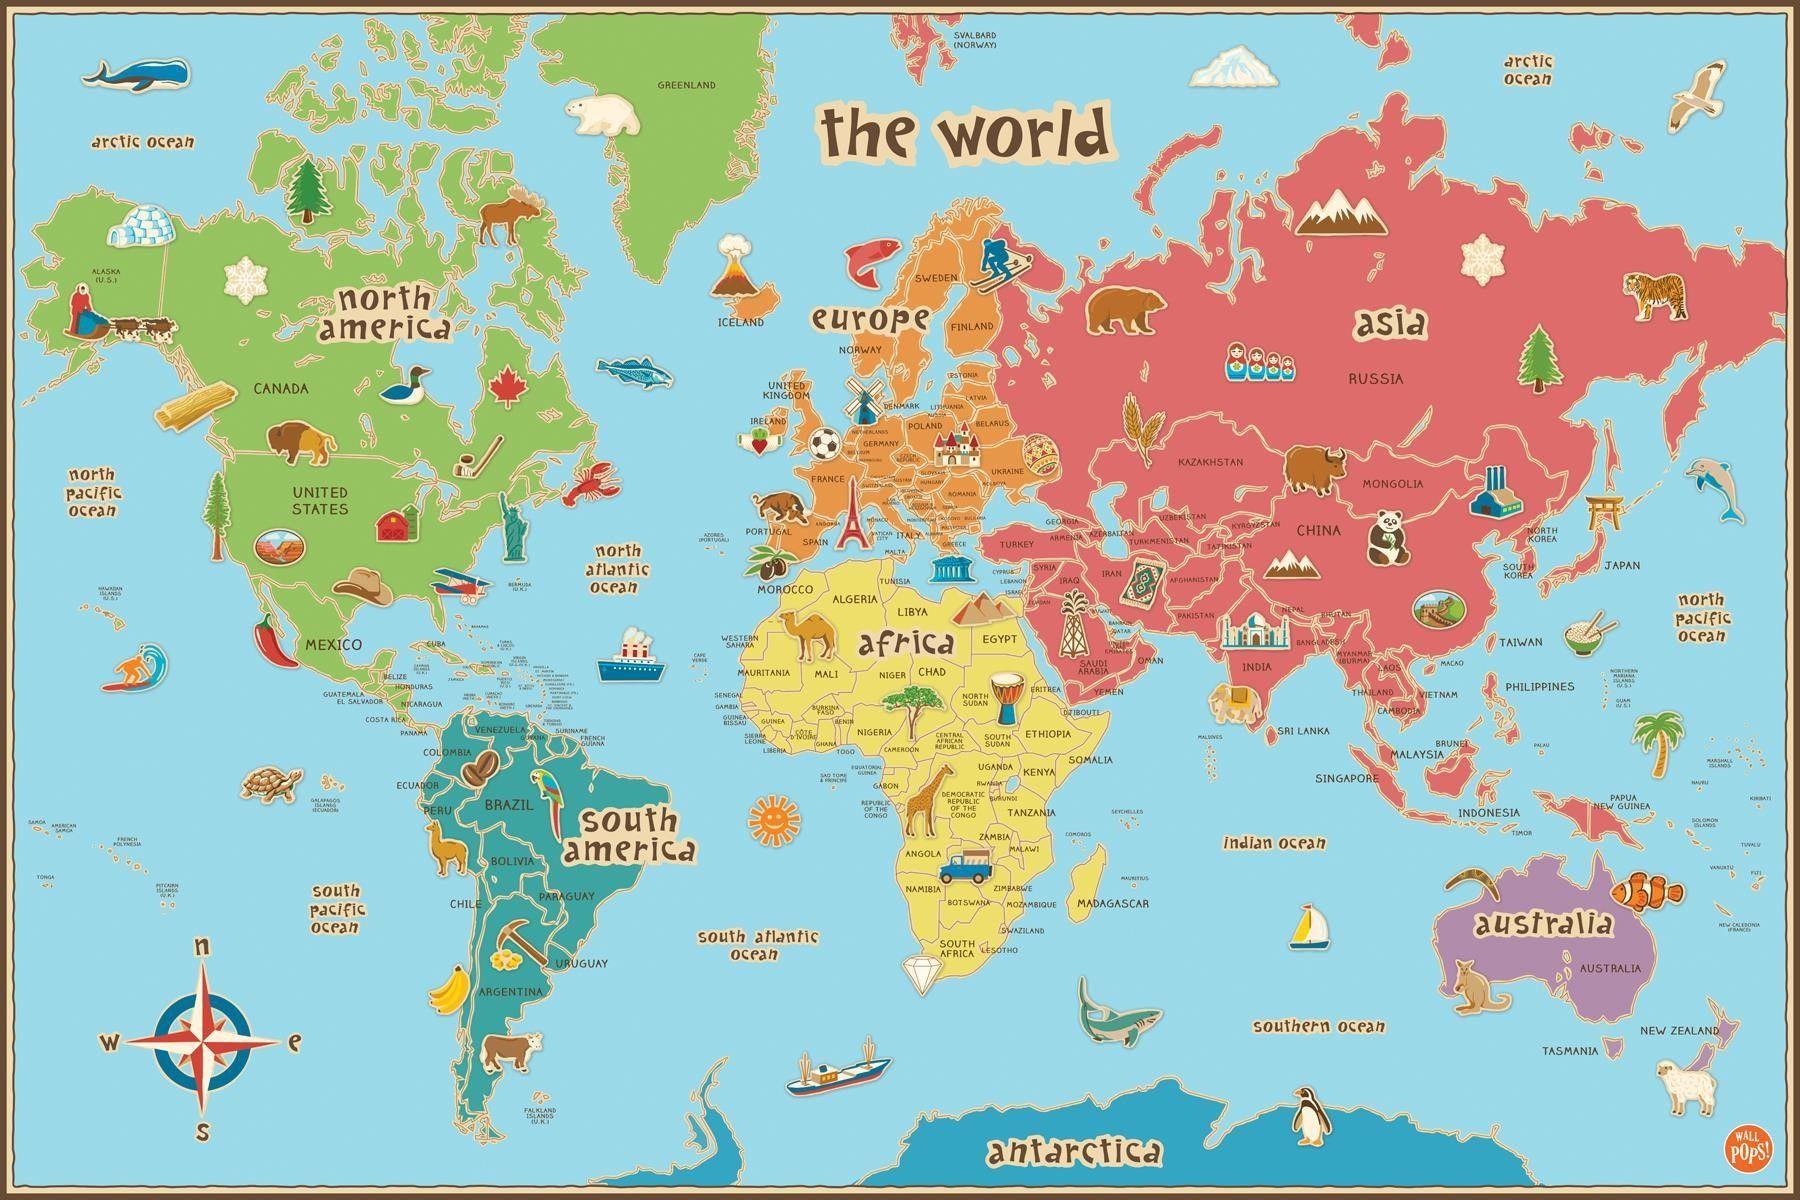 Printable Labeled World Maps - Lgq - Labeled World Map Printable